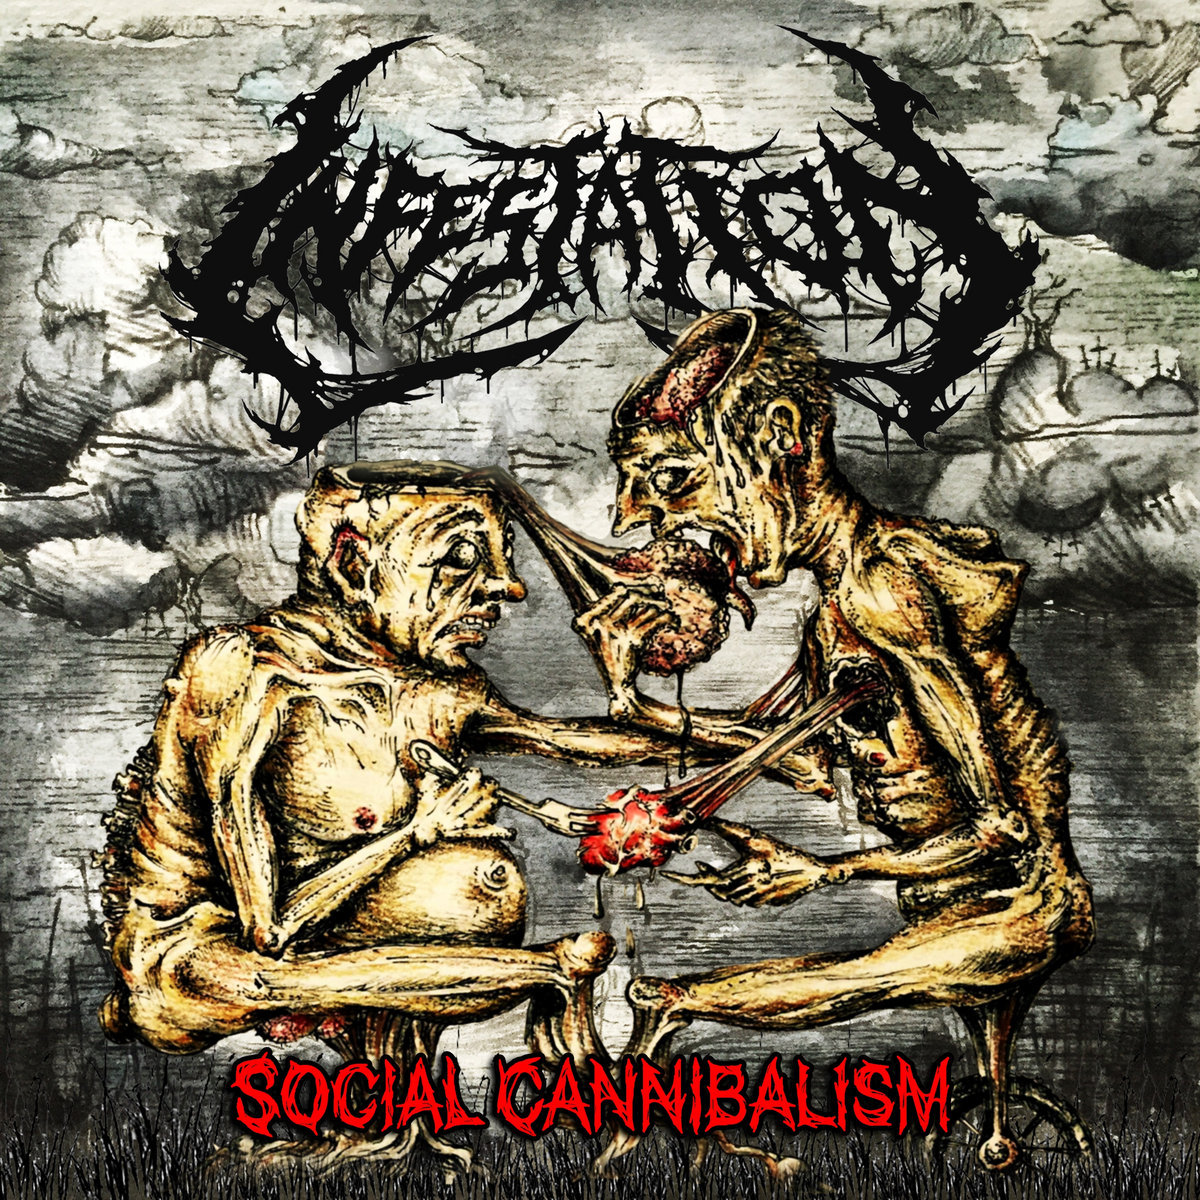 cannibalism CD: INFESTATION - Social Cannibalism